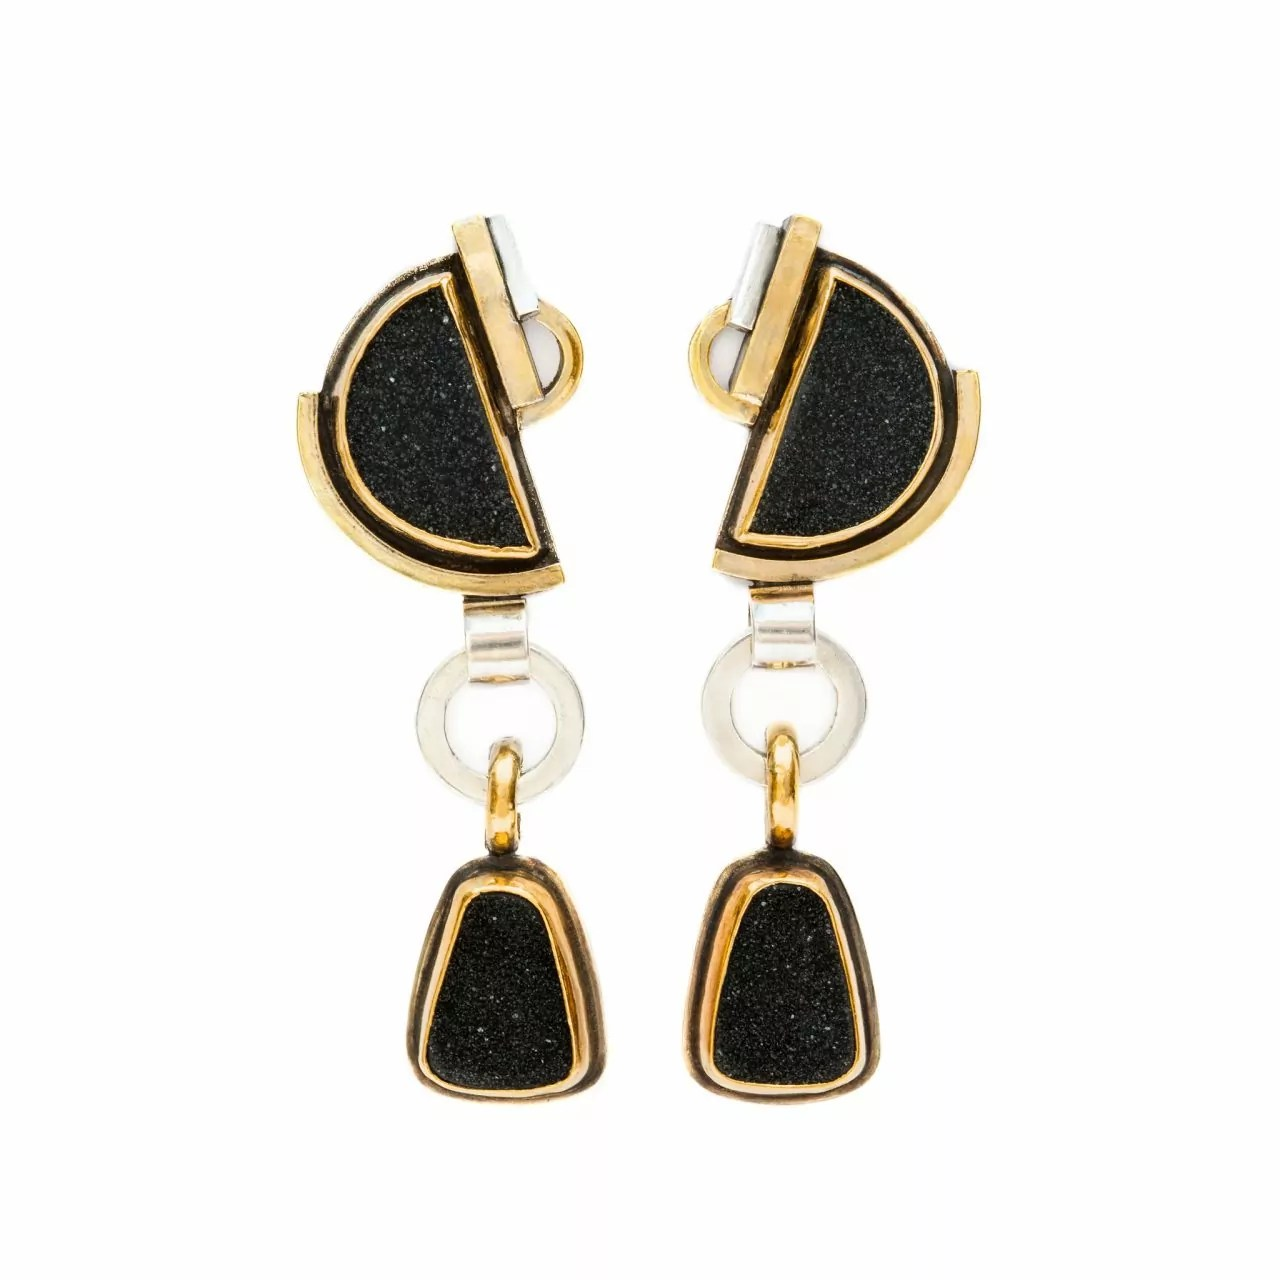 Earrings with Druzies